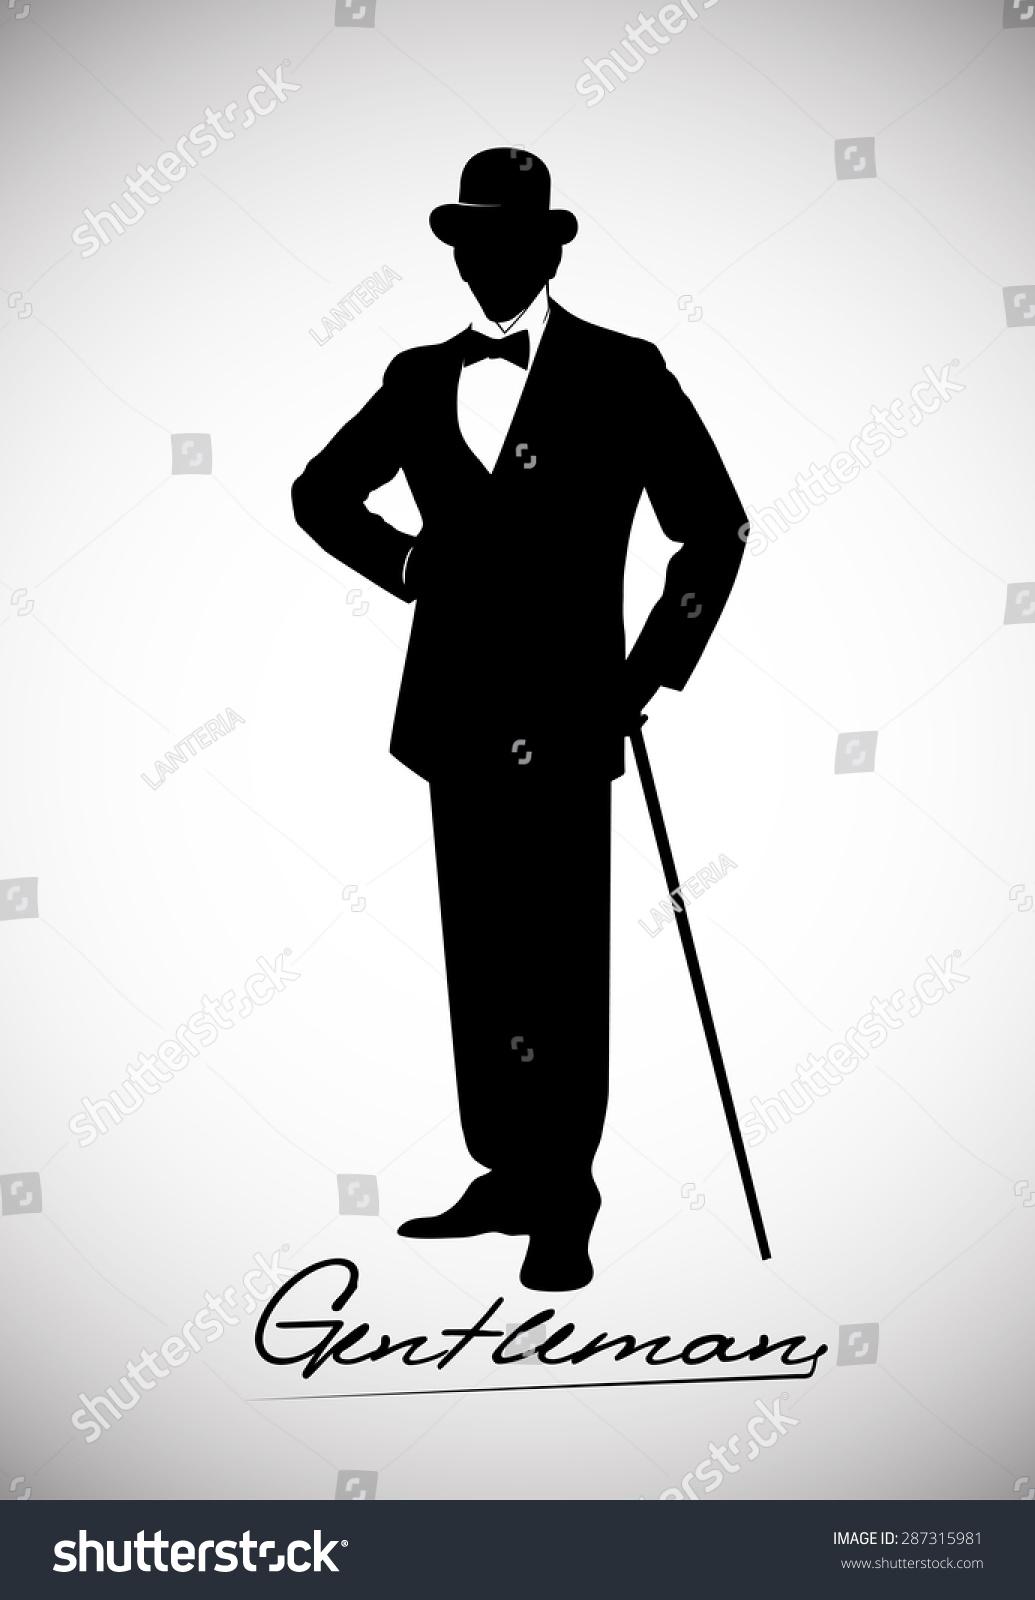 Man in suit silhouette clip art